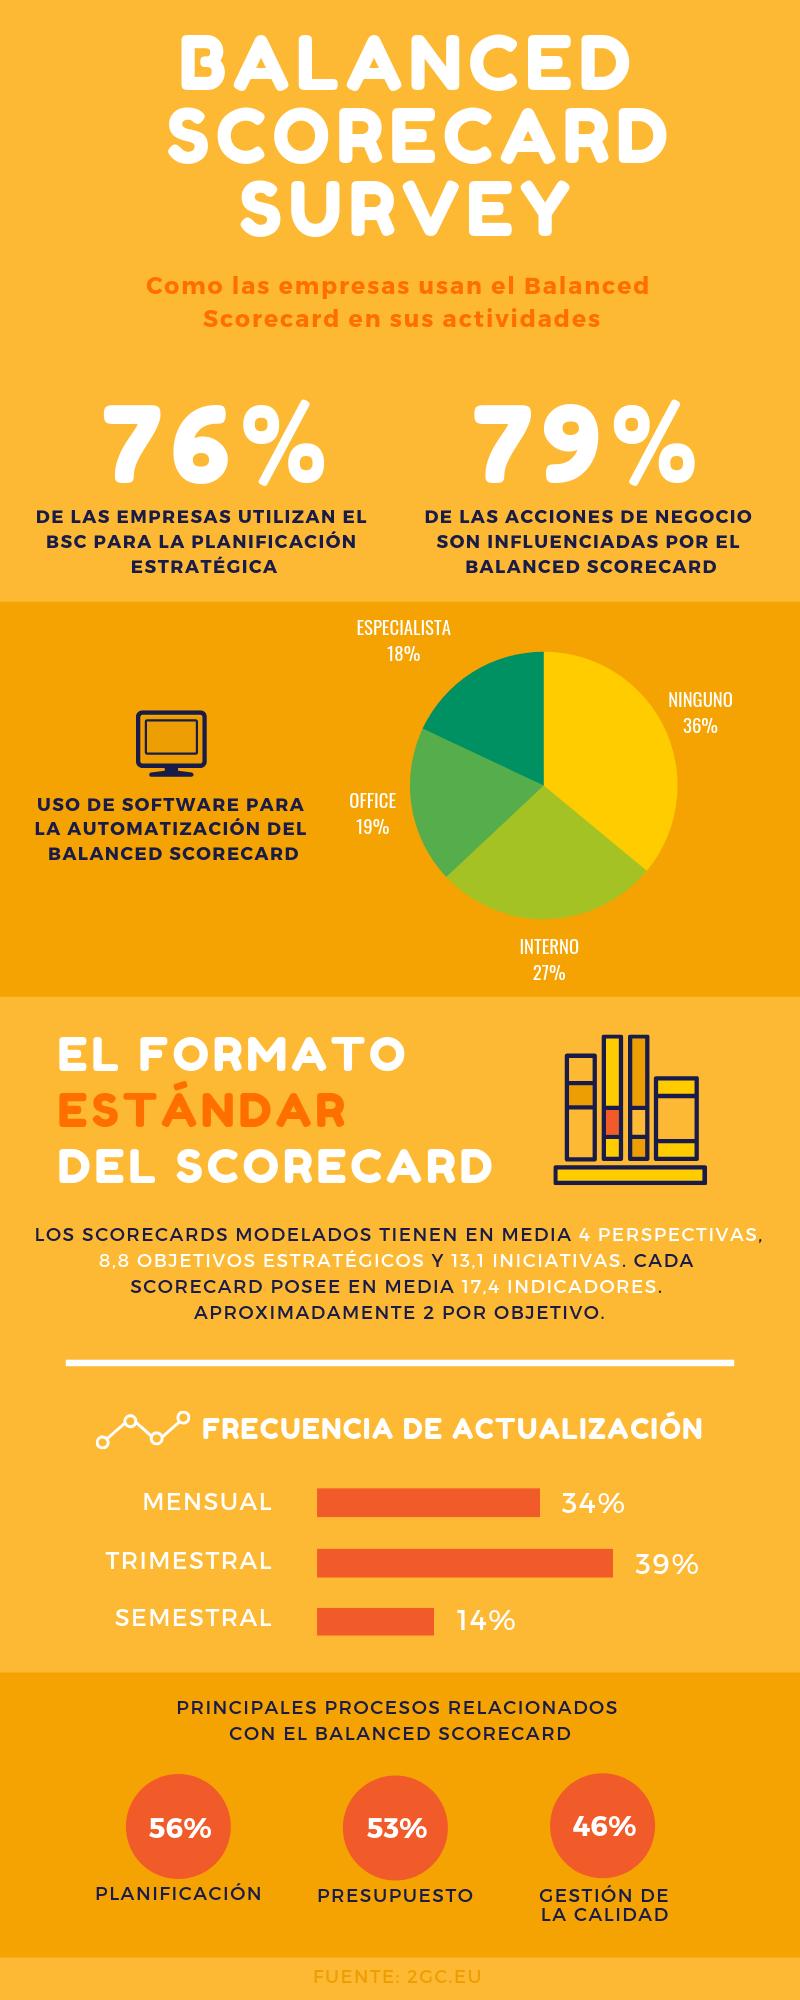 Balanced scorecard survey - español